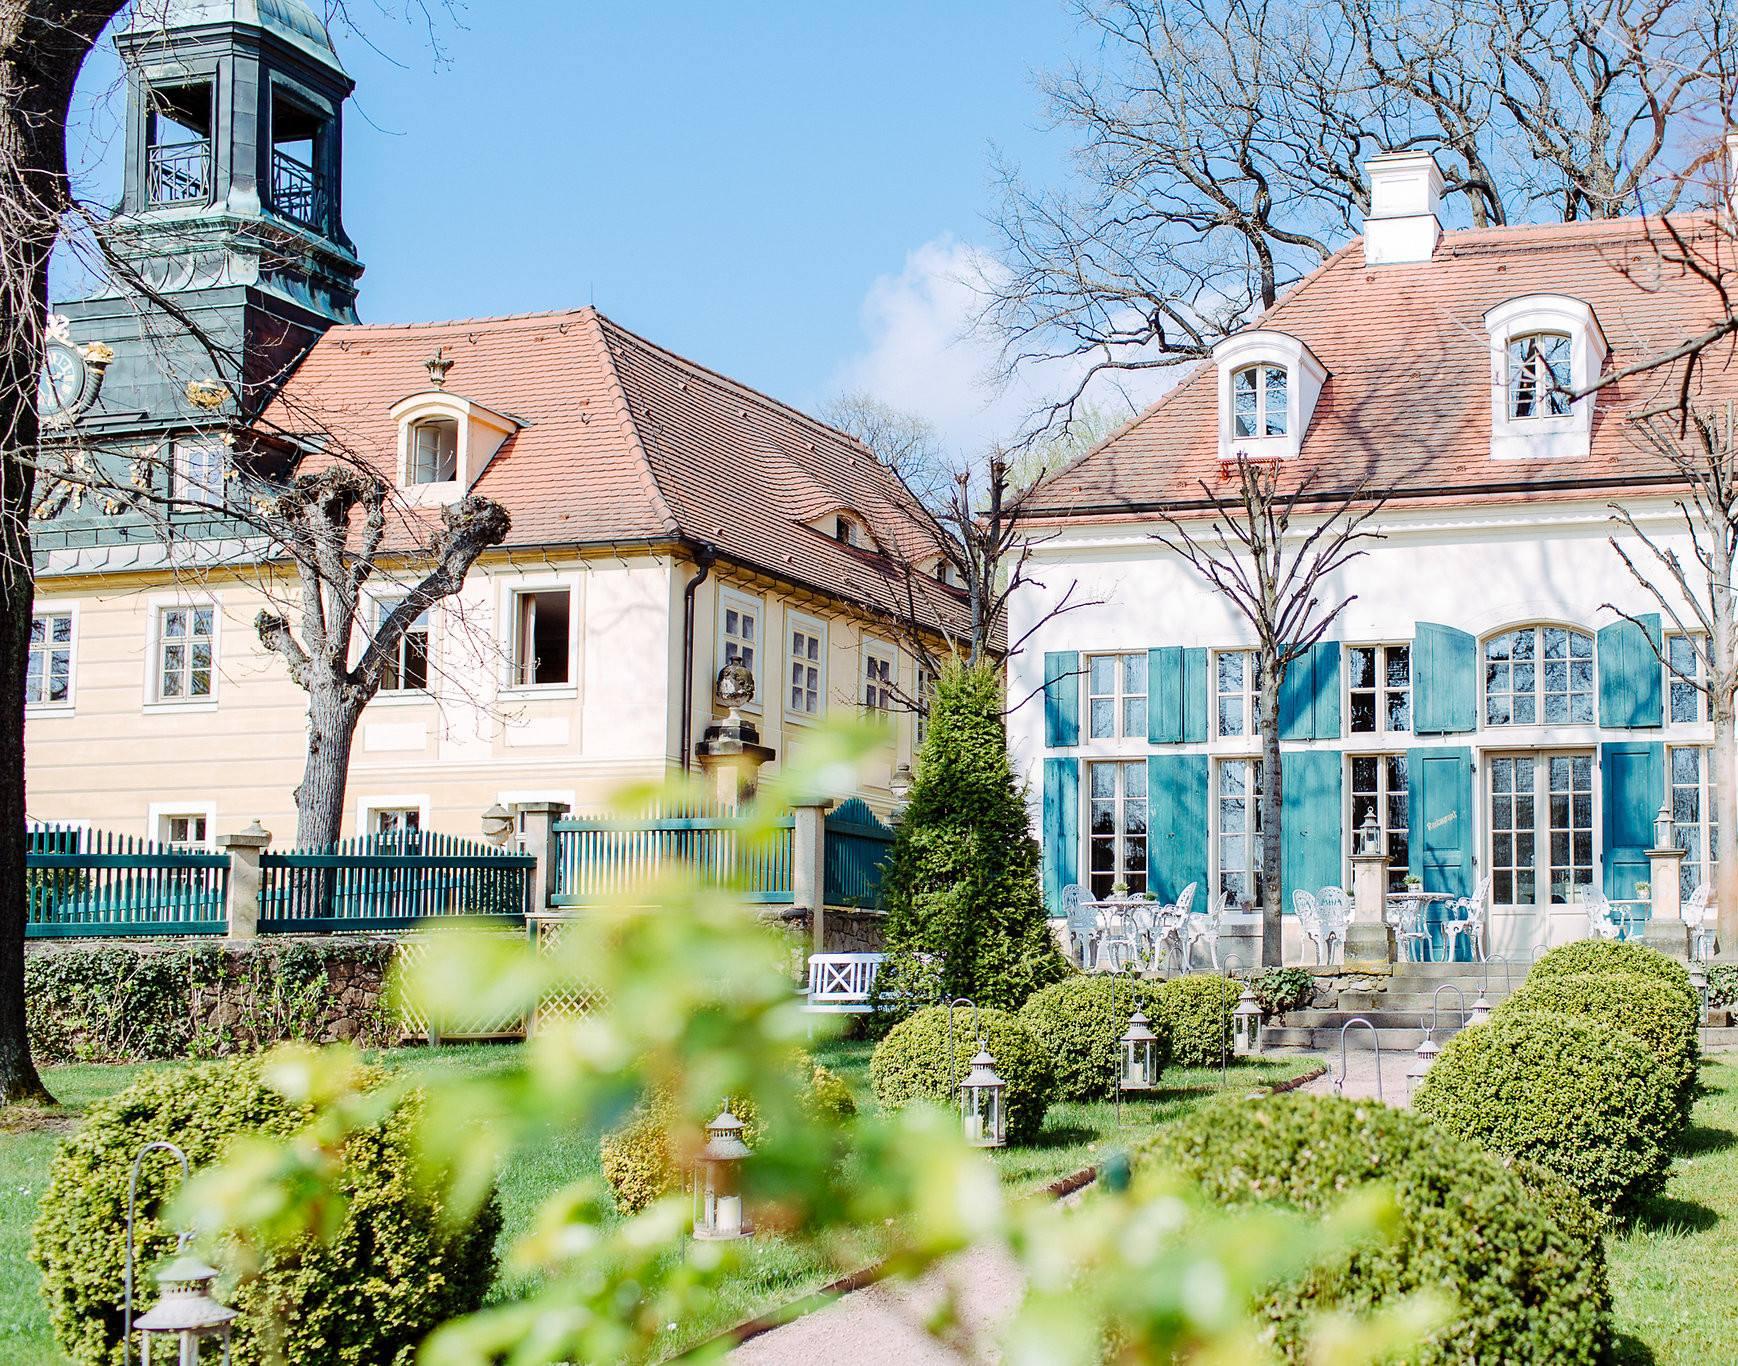 Hotel Villa Sorgenfrei & Atelier Sanssouci in Radebeul